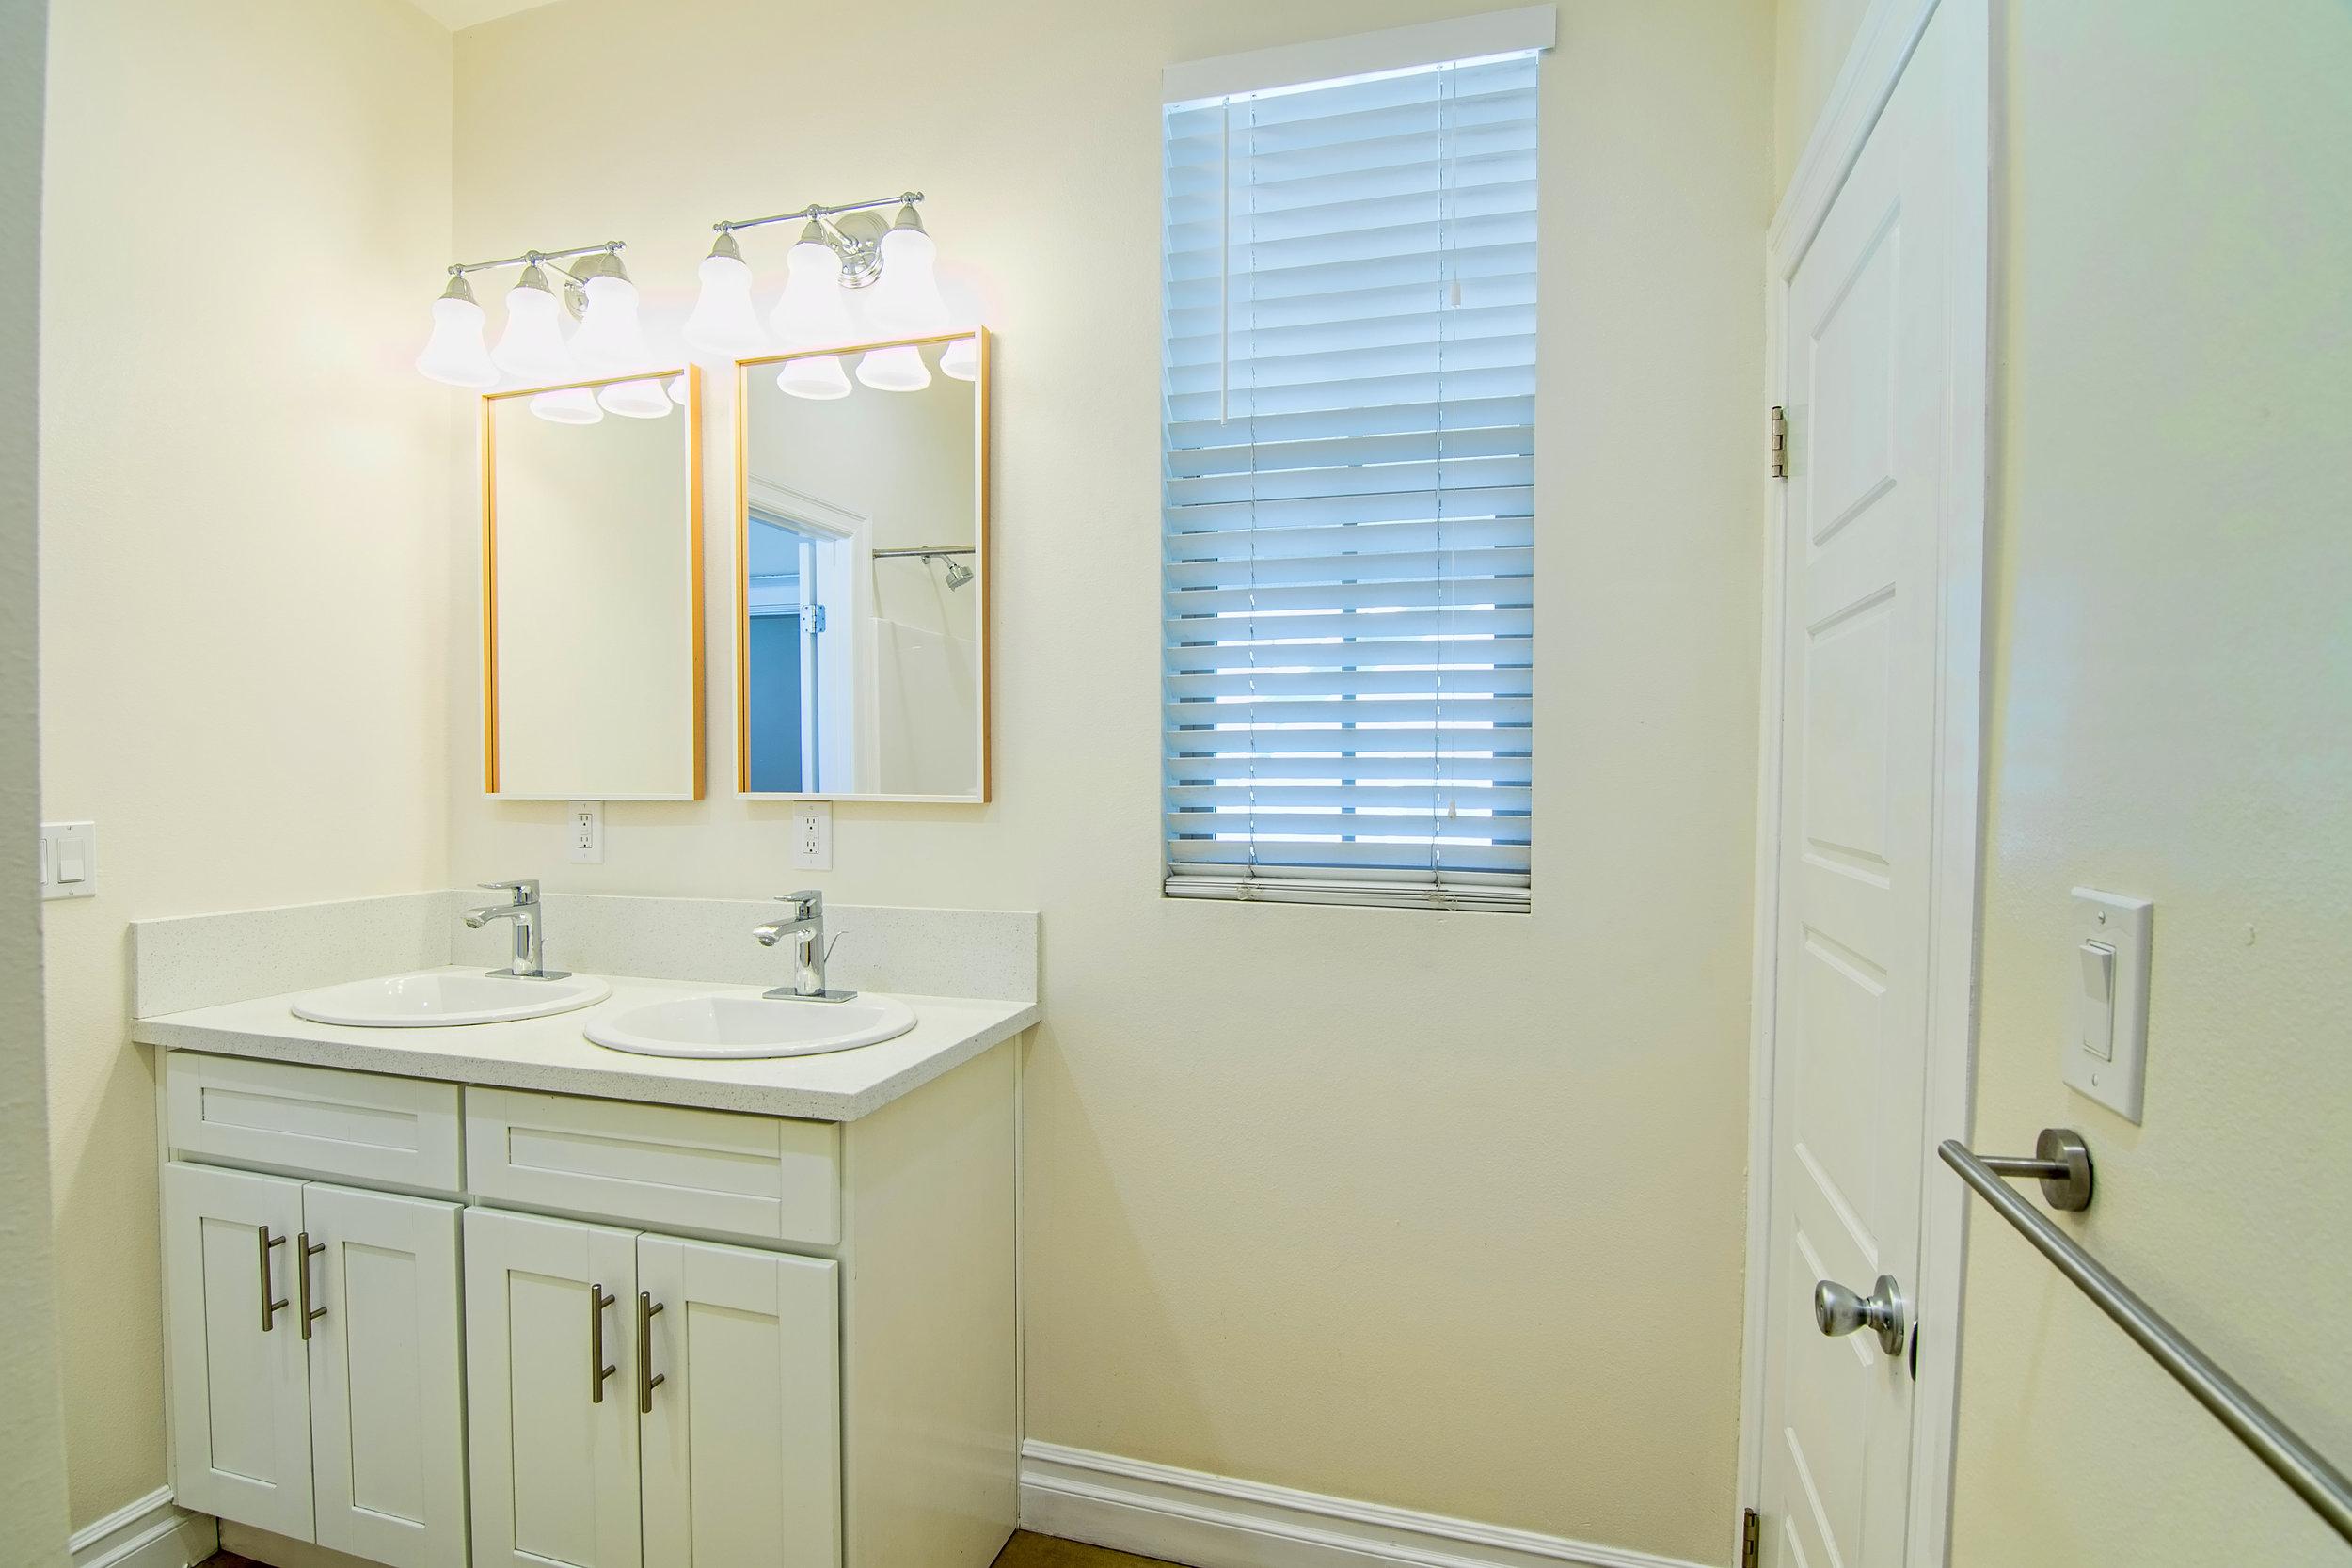 Post-Renovation Bathroom